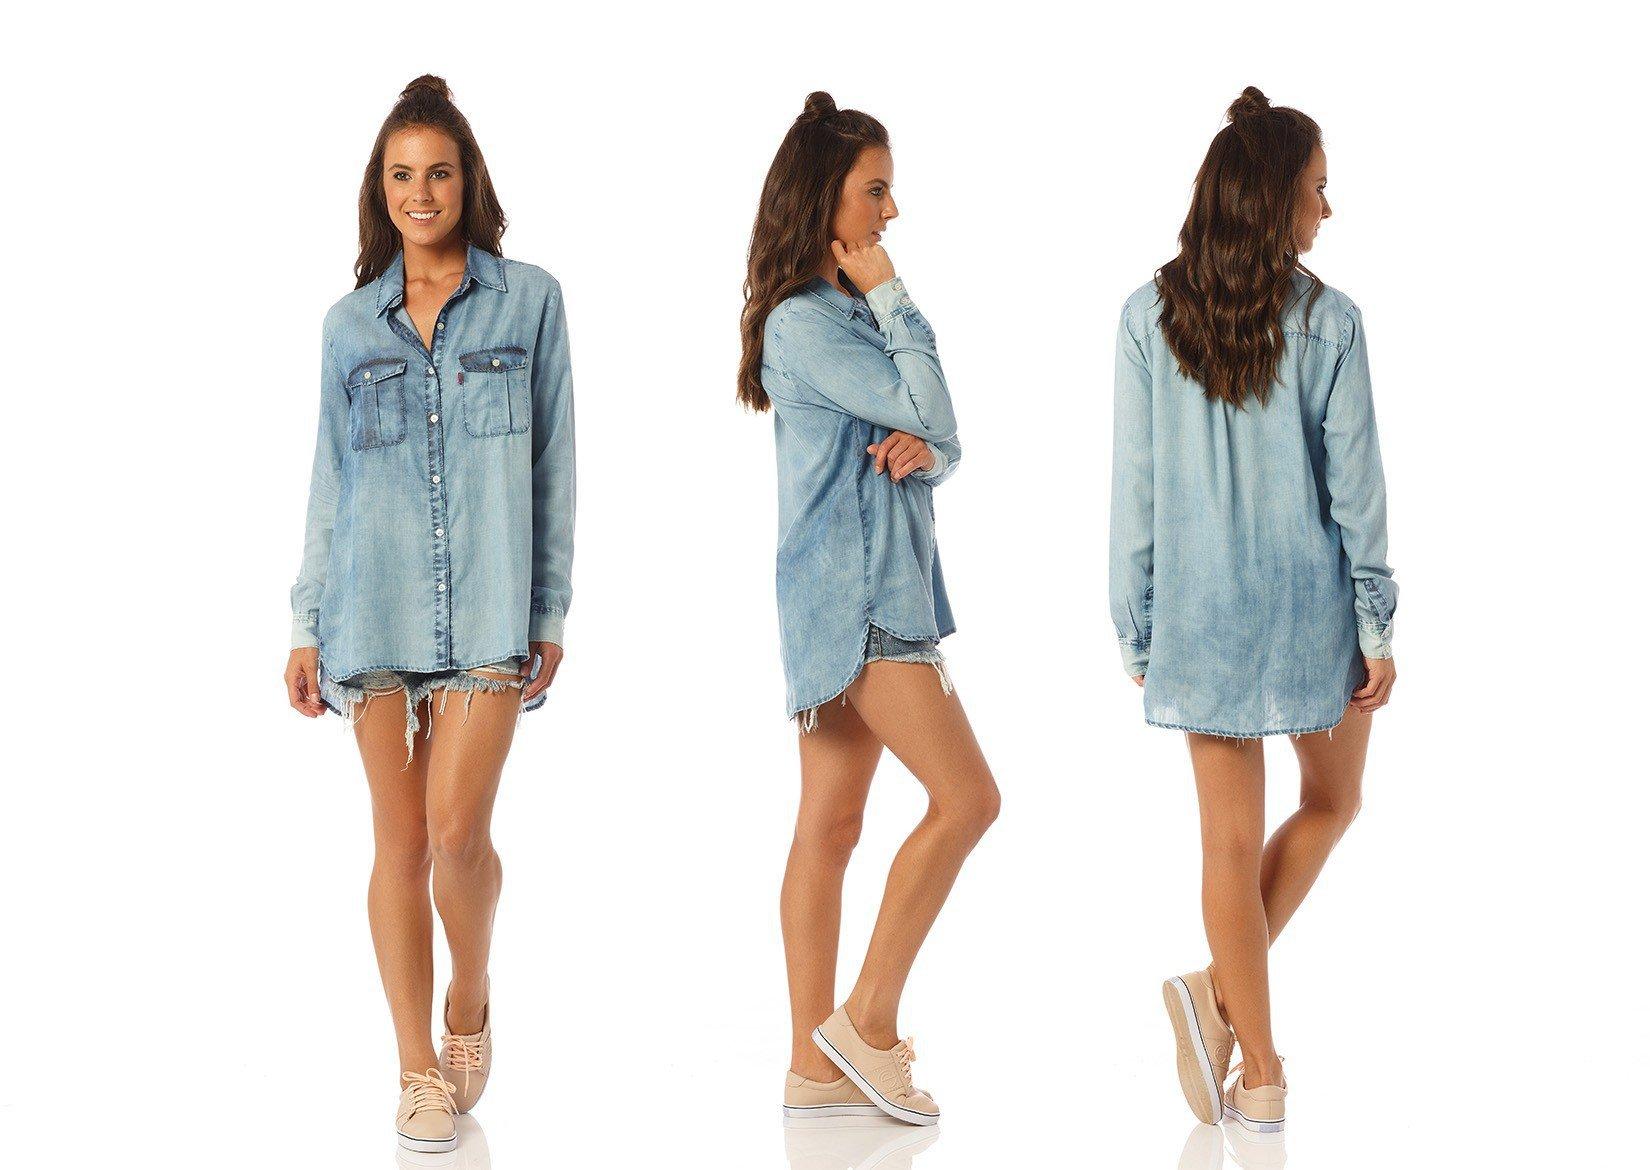 camisa feminina oversize com marcacao dz11100 denim zero descricao